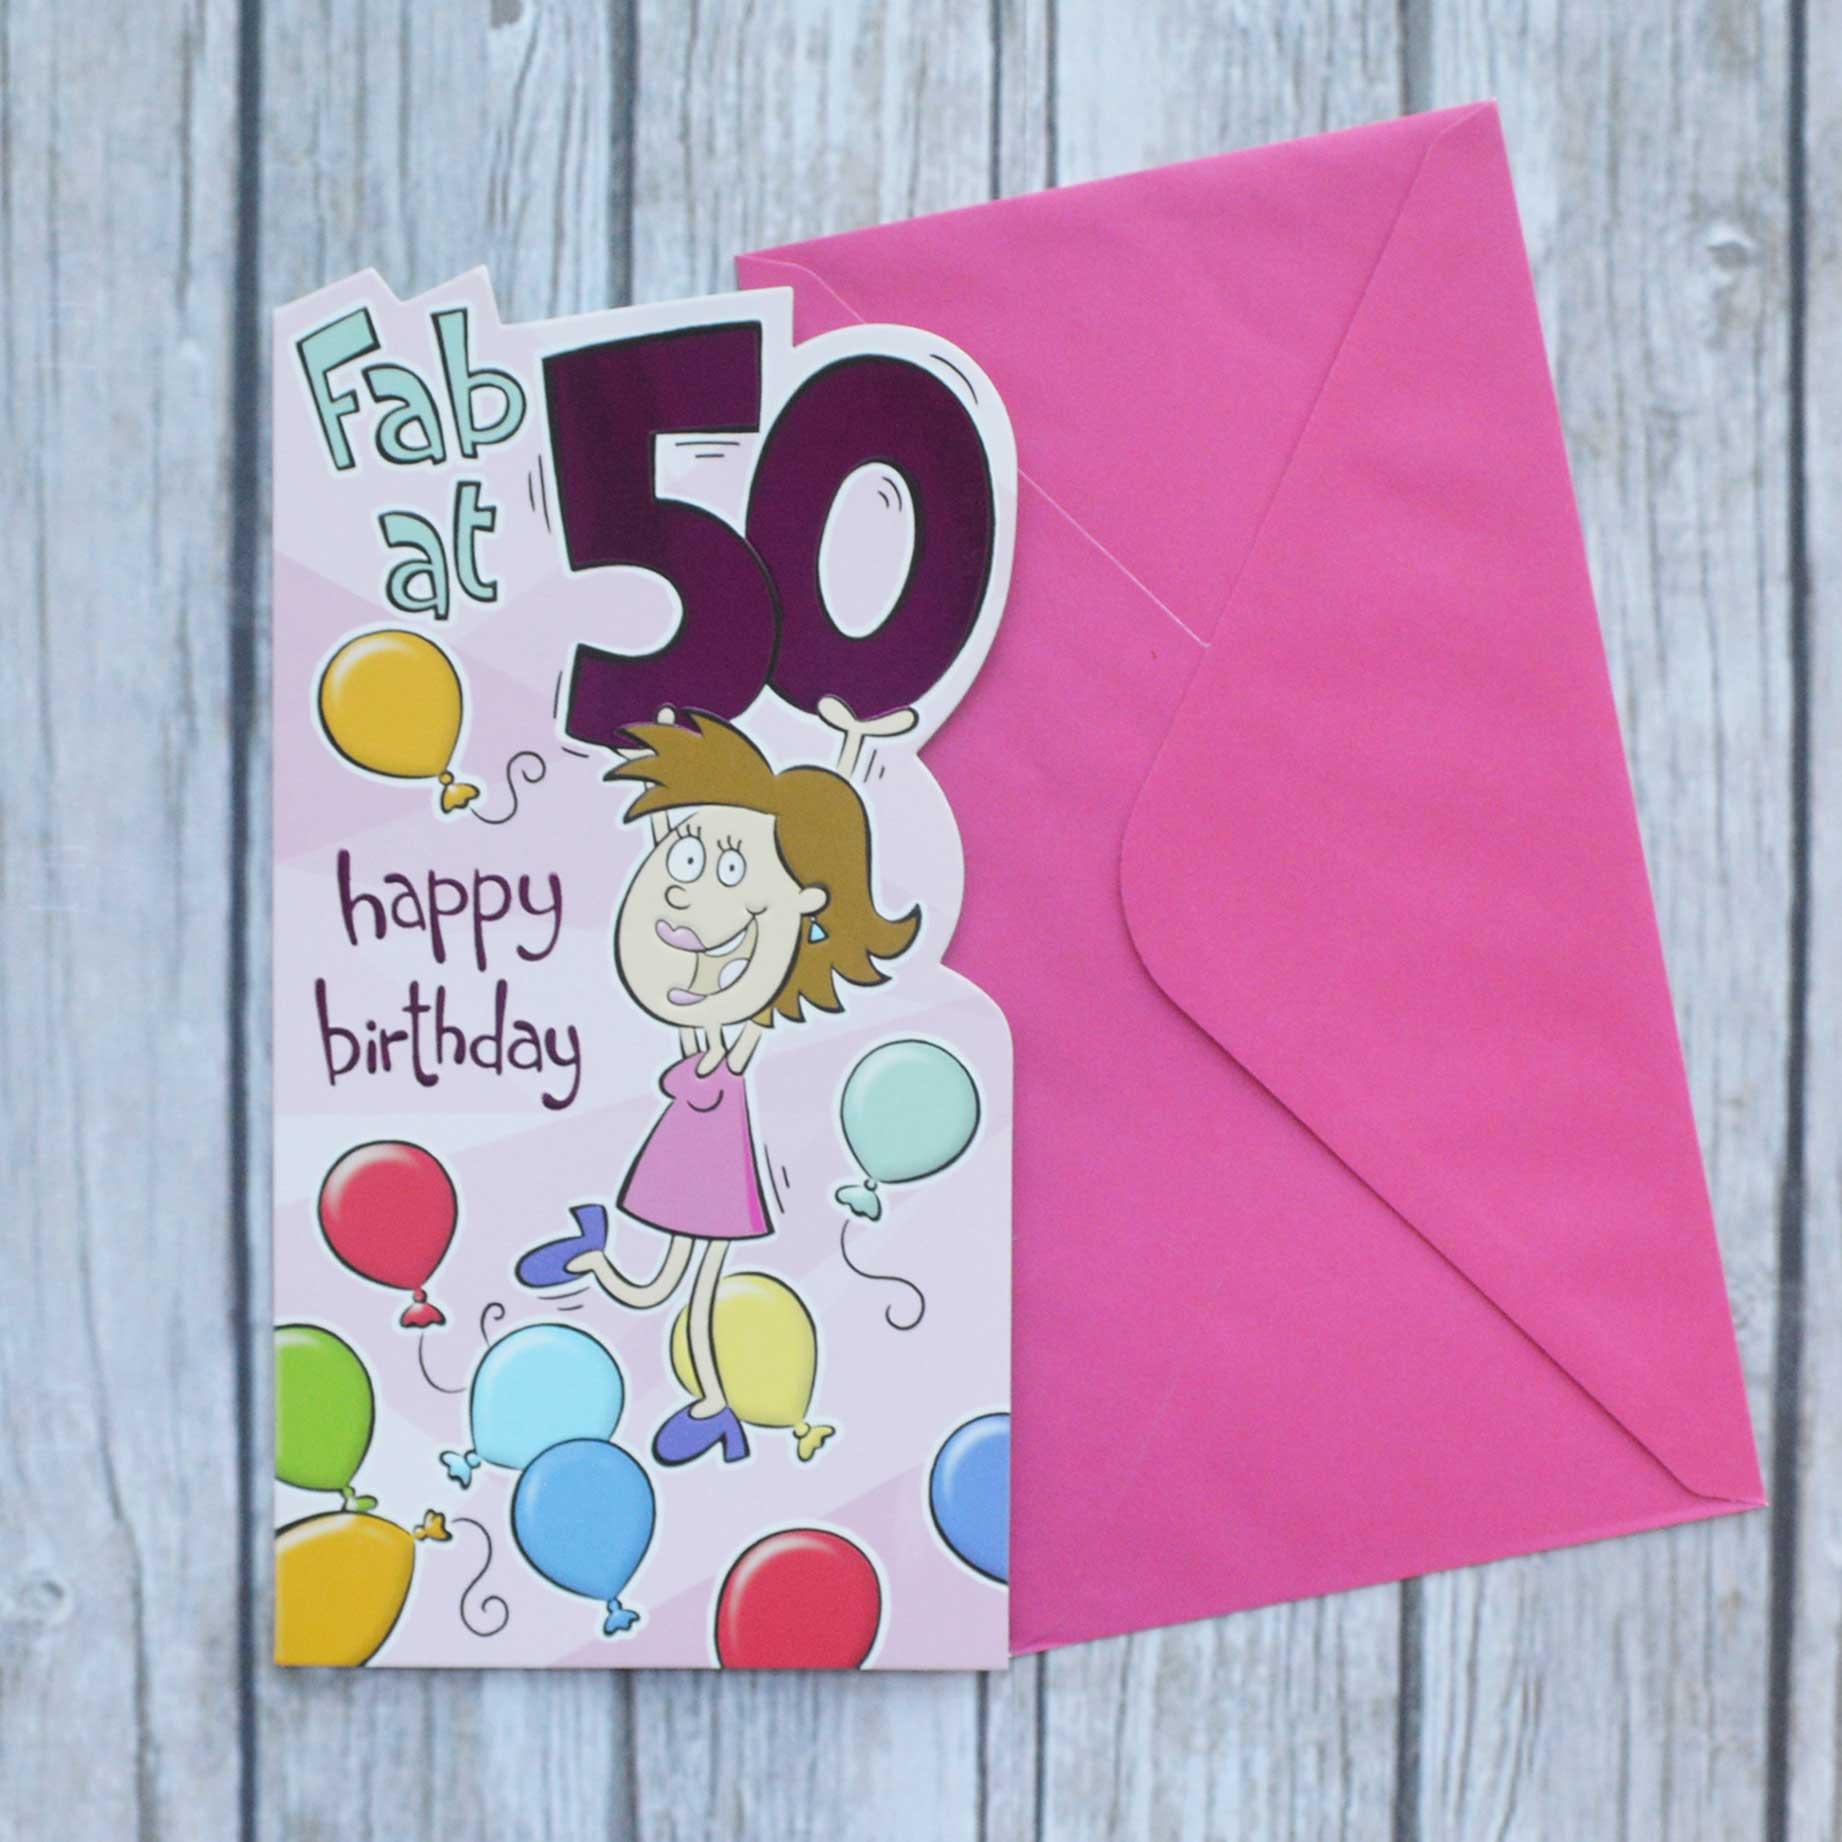 Fab 50 Birthday: 50th Birthday Card Fab At 50